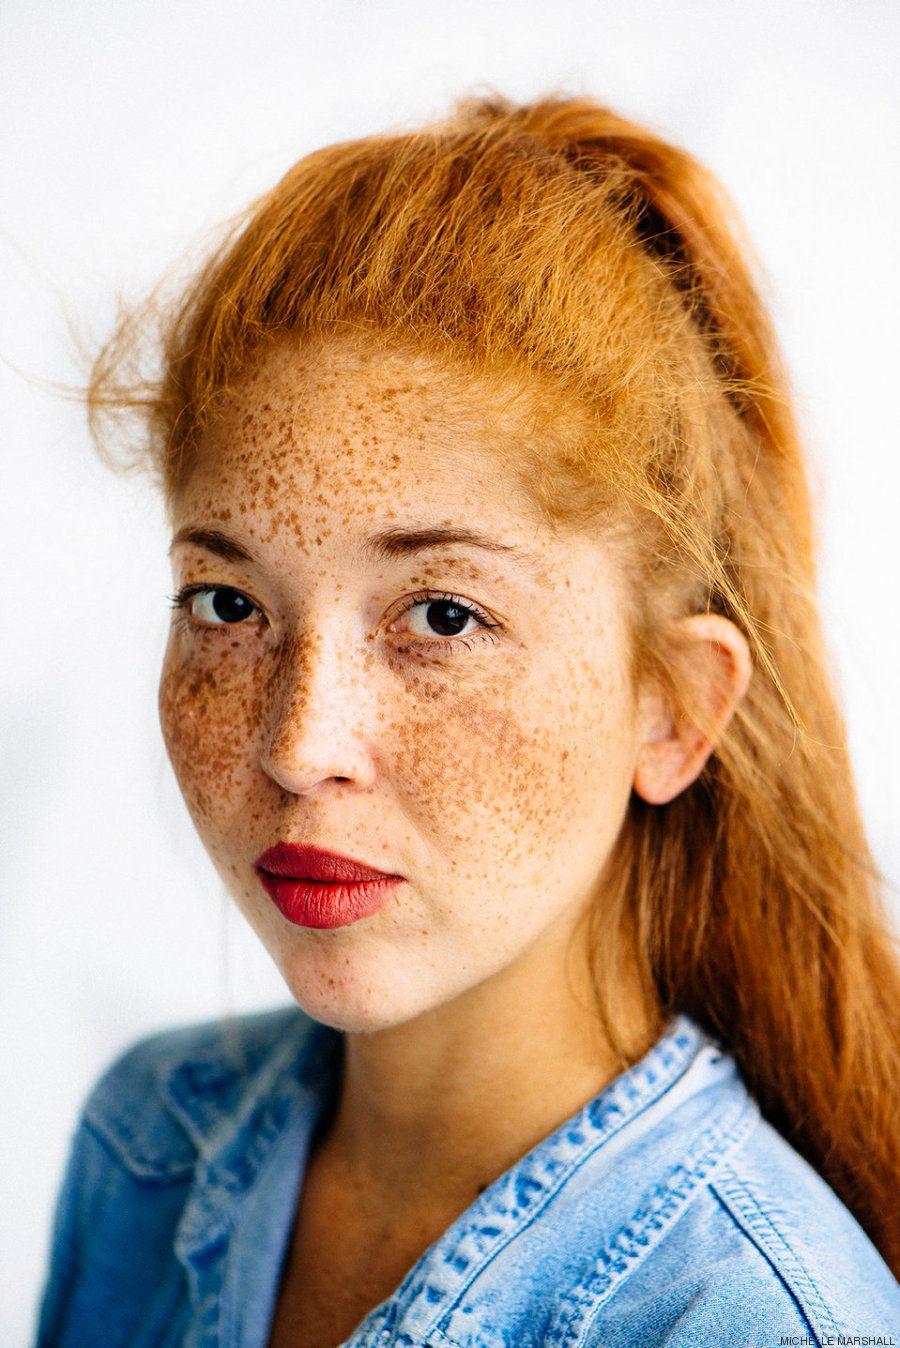 Esta fotógrafa explora la hermosa diversidad de los negros